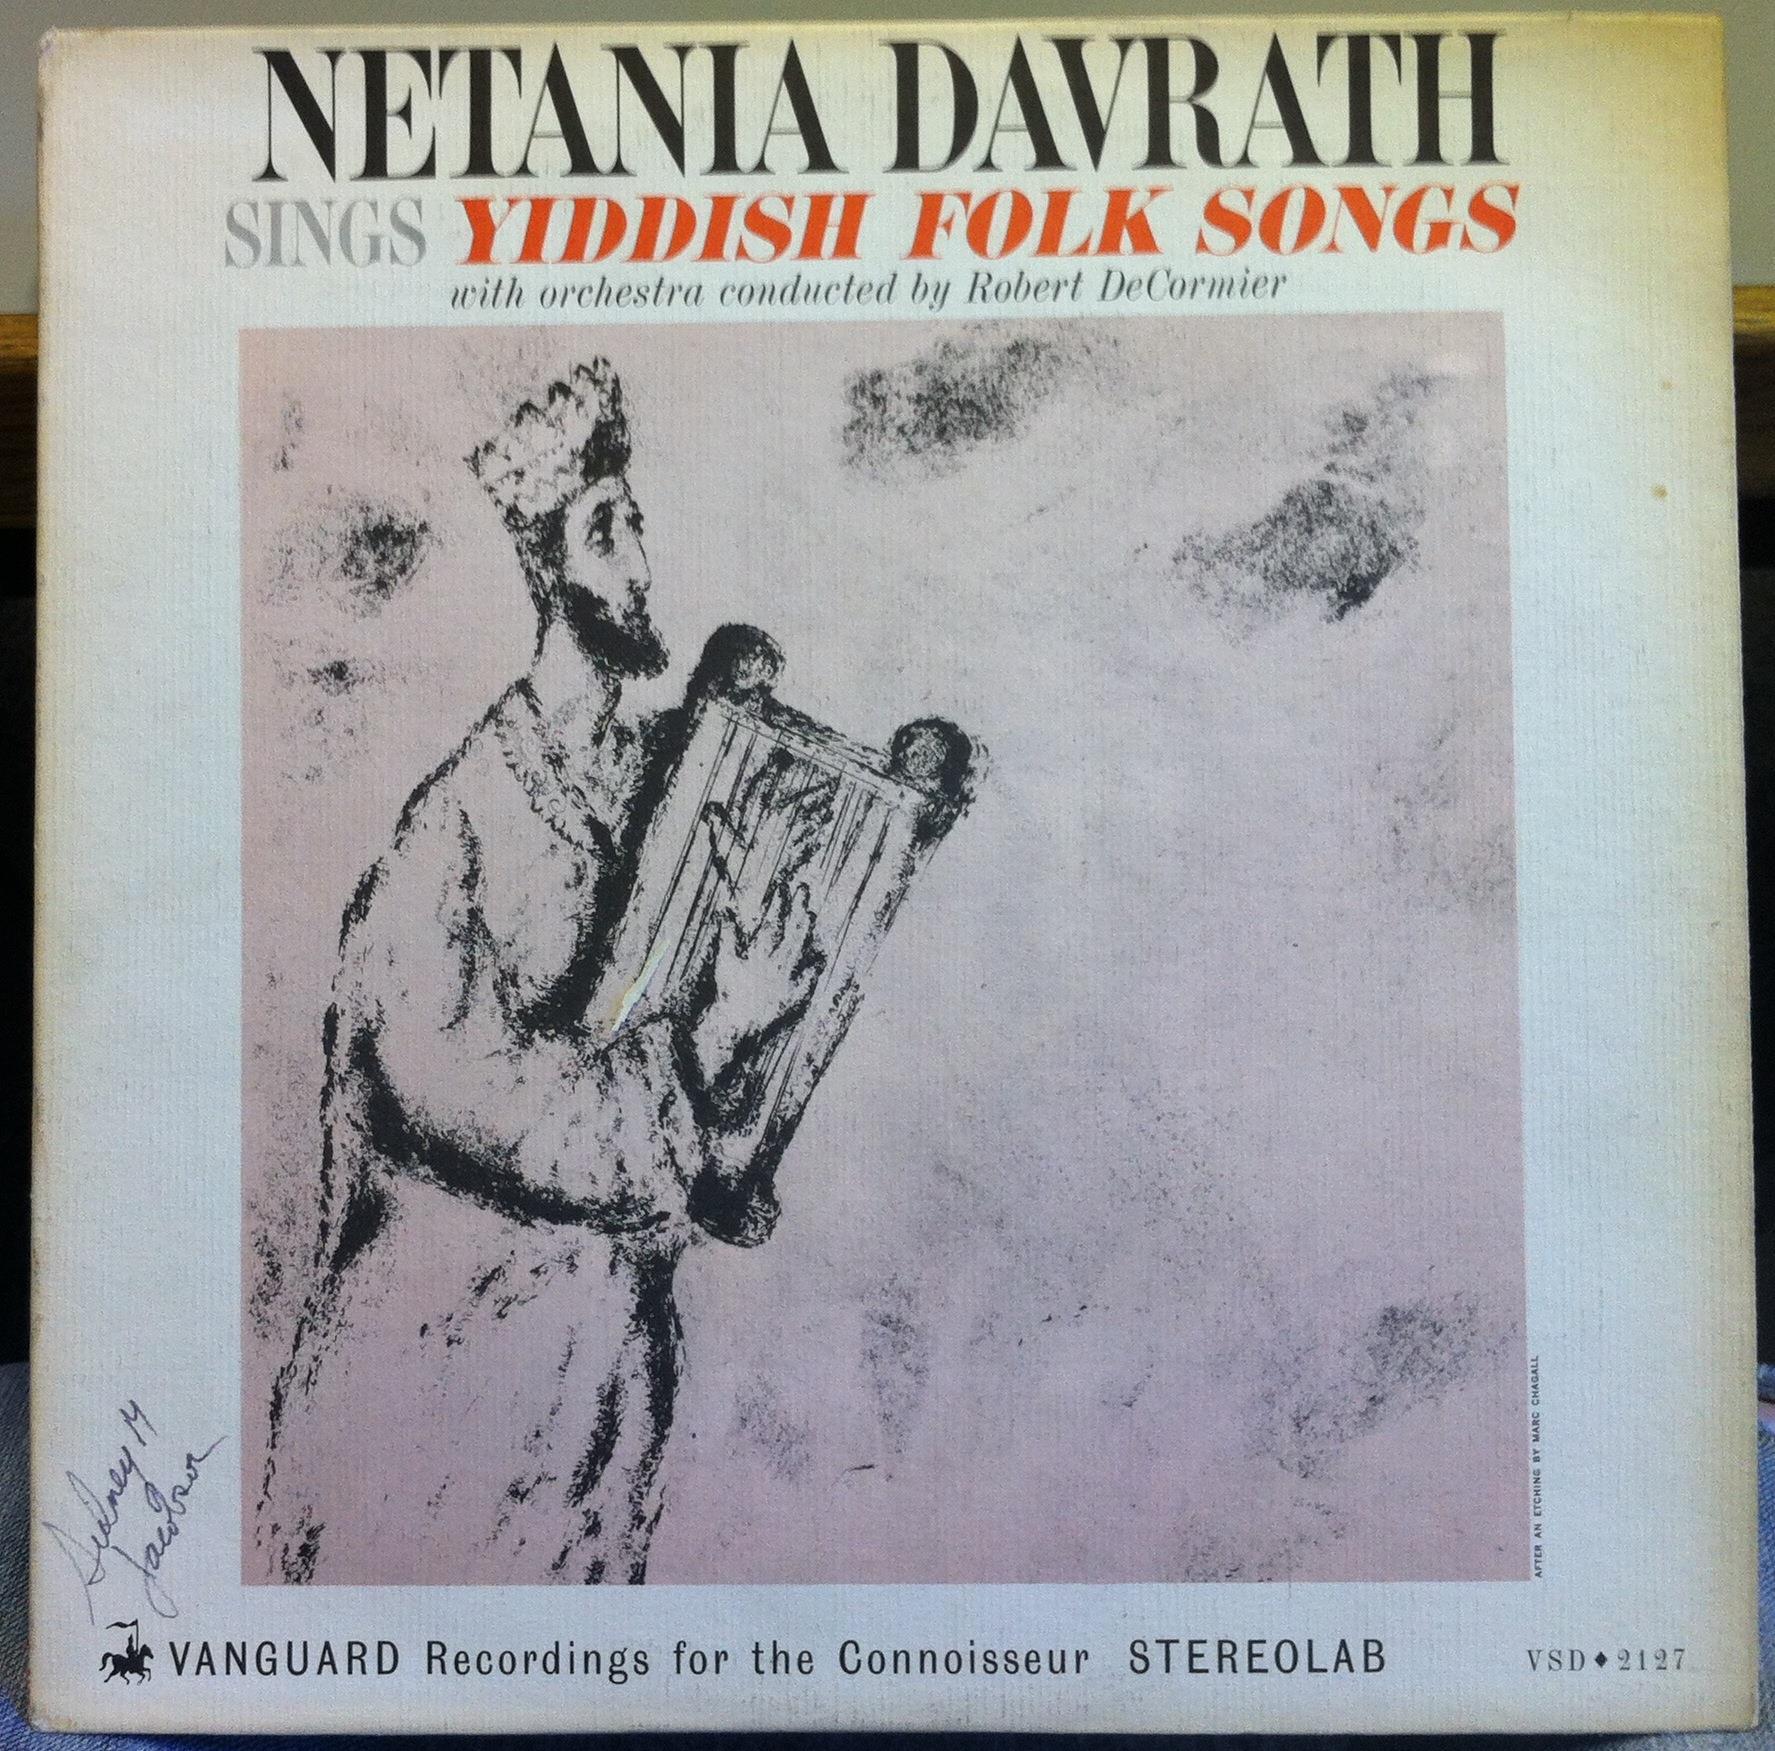 Sings Yiddish Folk Songs